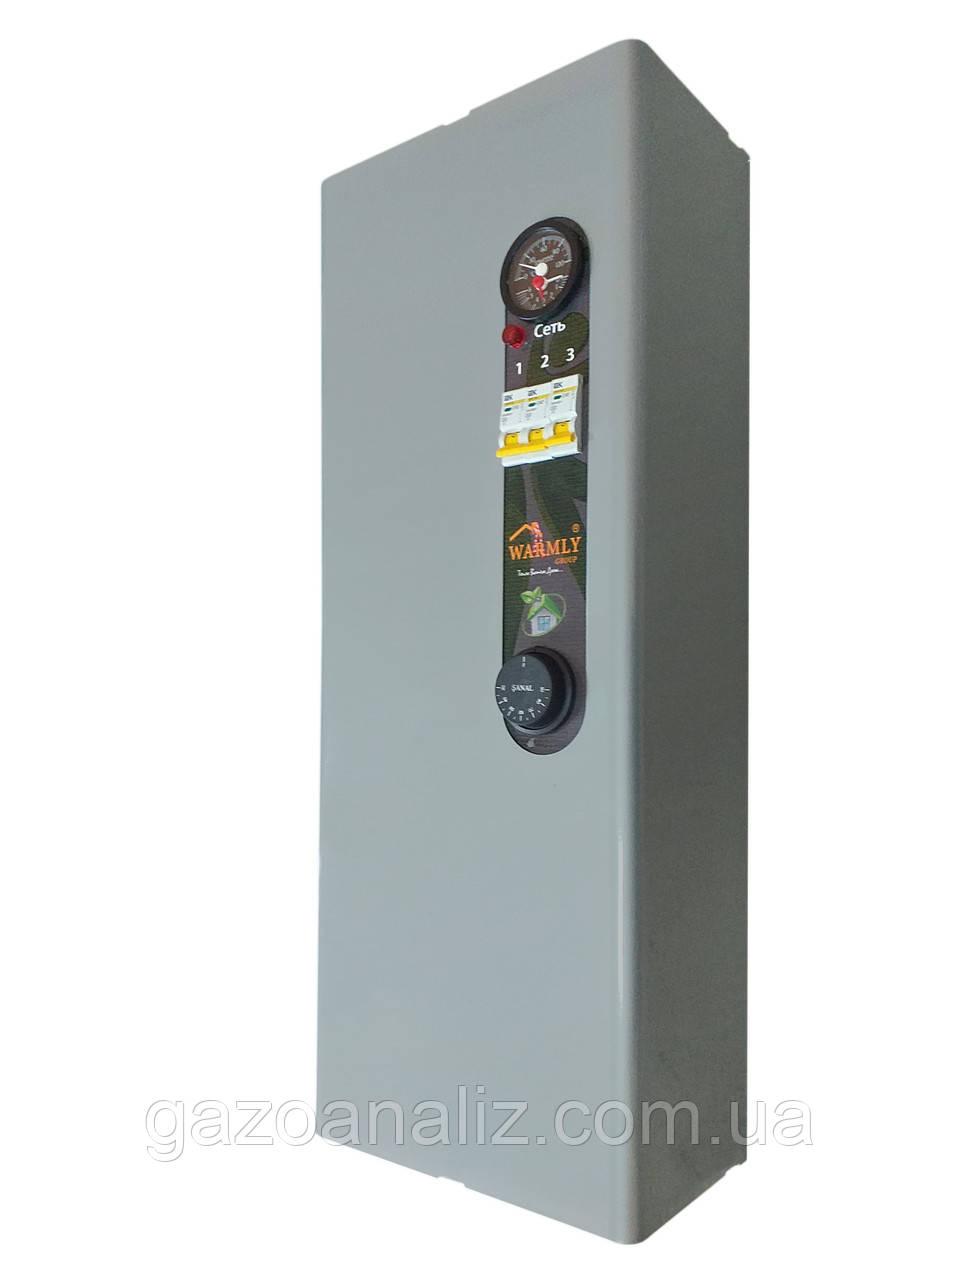 Електрокотел Warmly WCSMG 4,5/220/380 магн.пуск. з групою безпеки